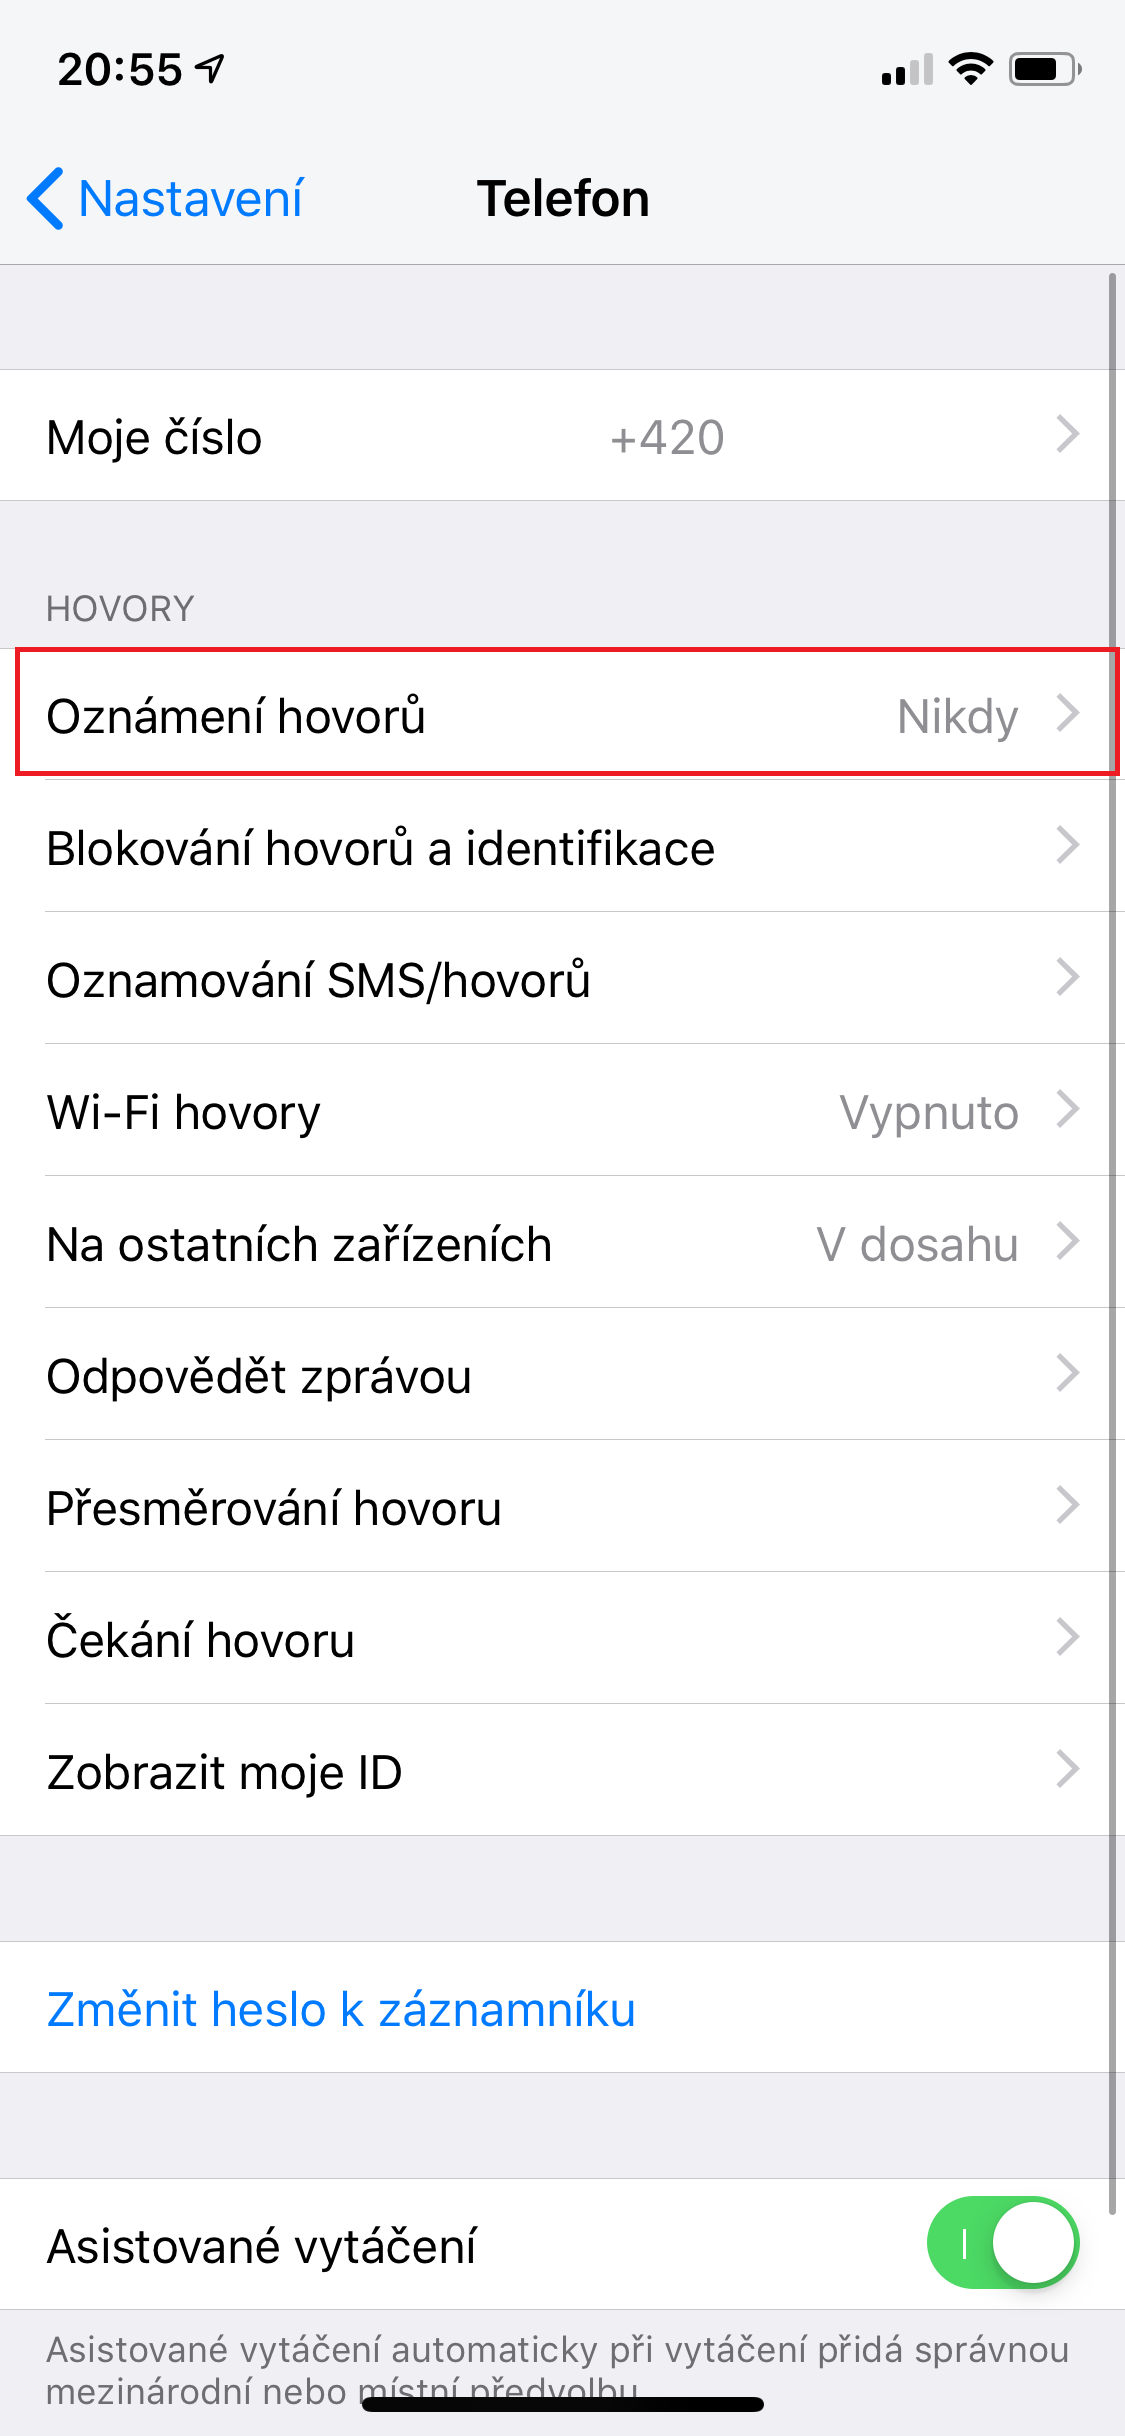 oznameni_hovoru (2)